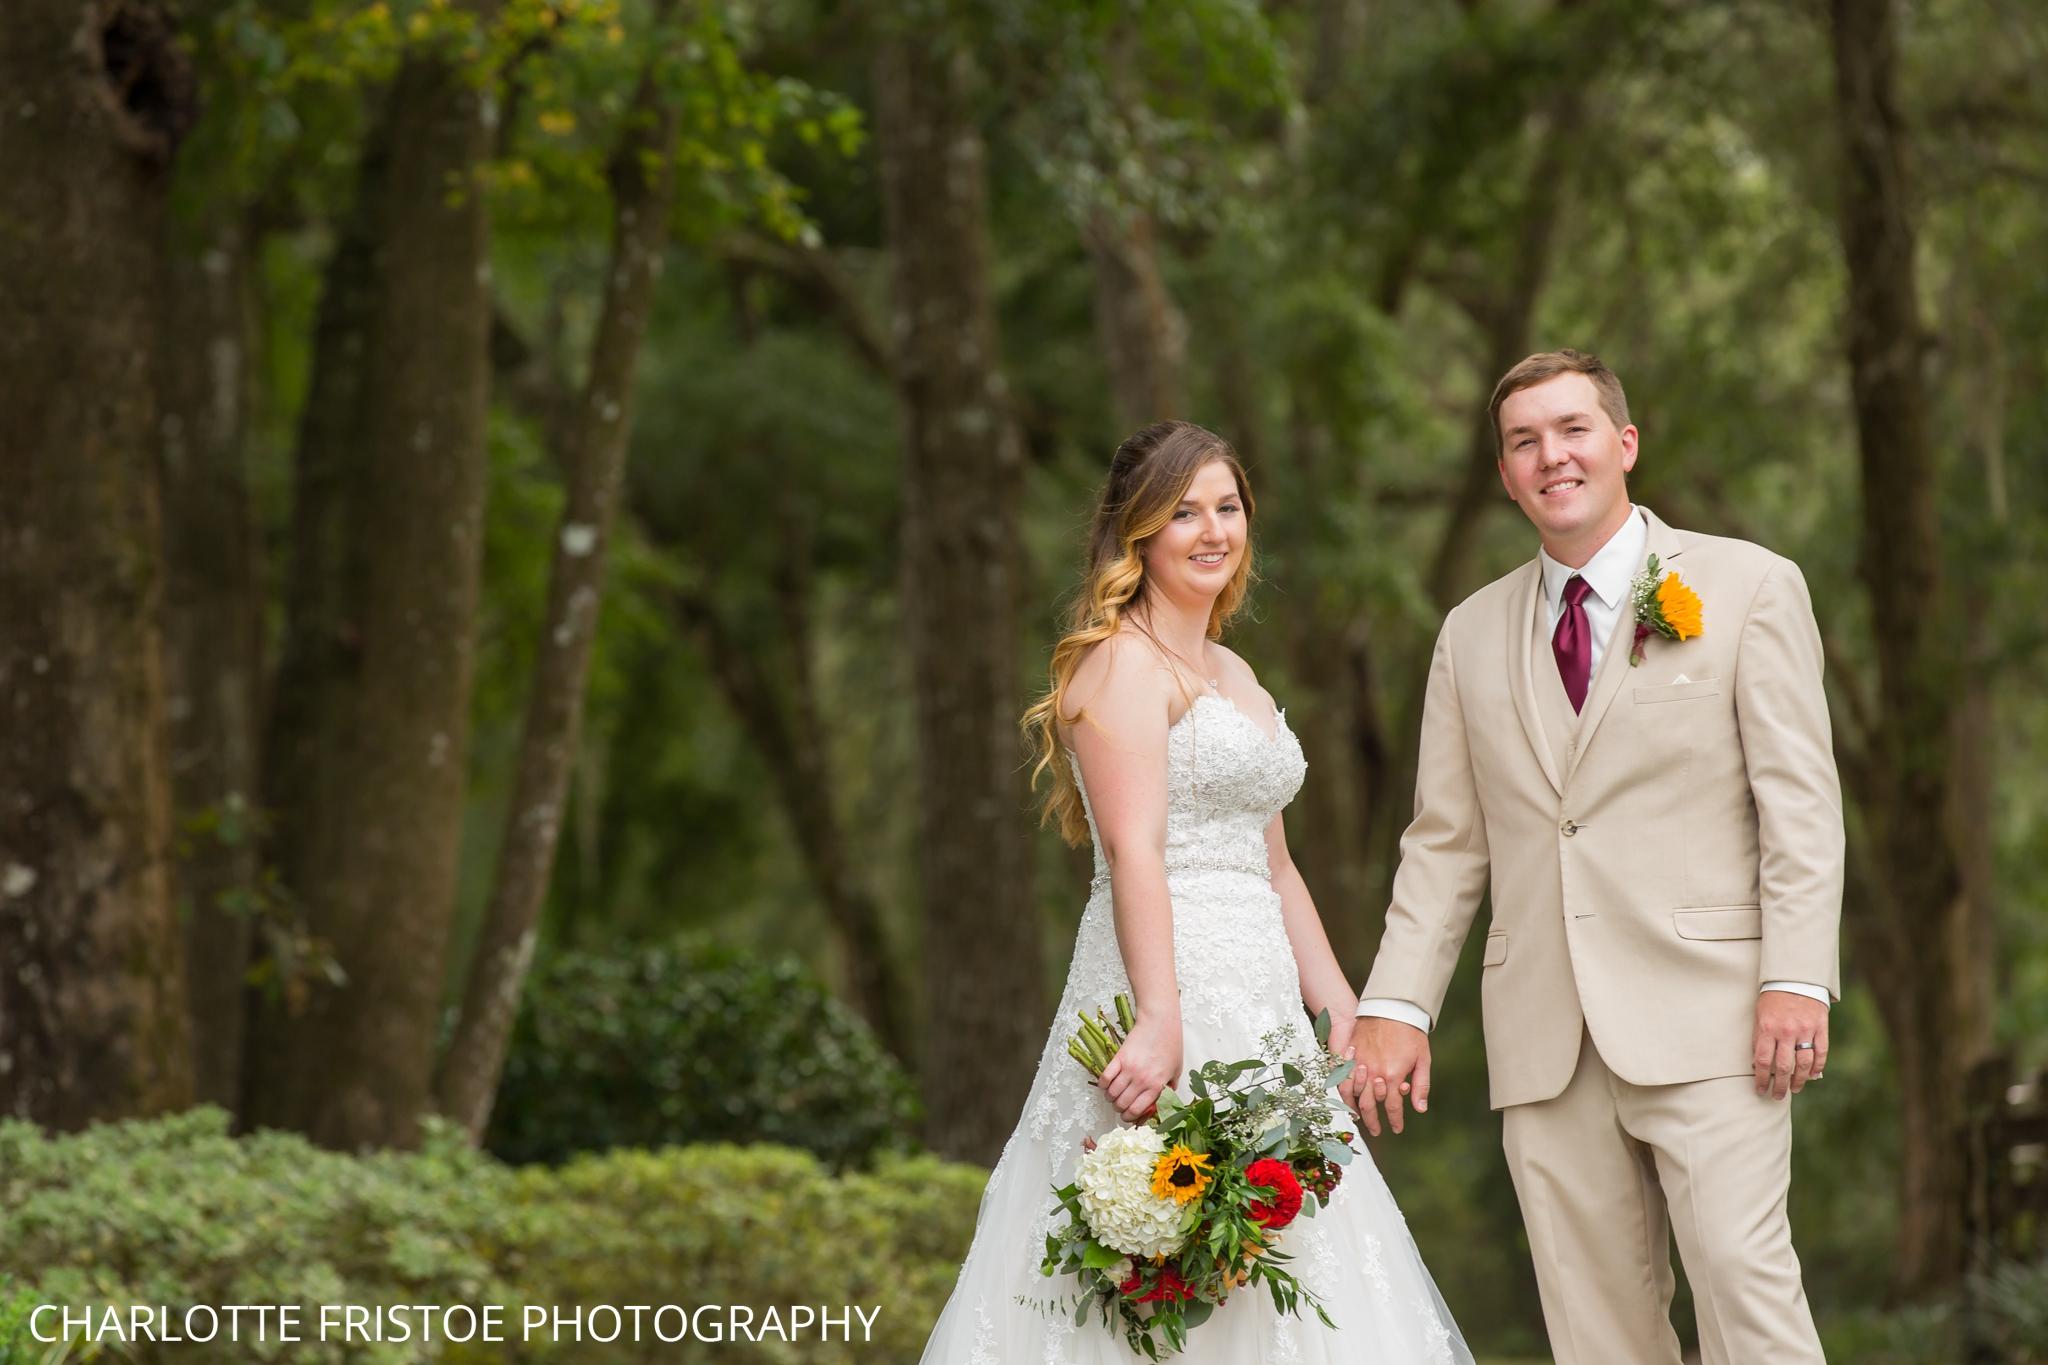 Tallahassee_Wedding_Charlotte_Fristoe-49.jpg